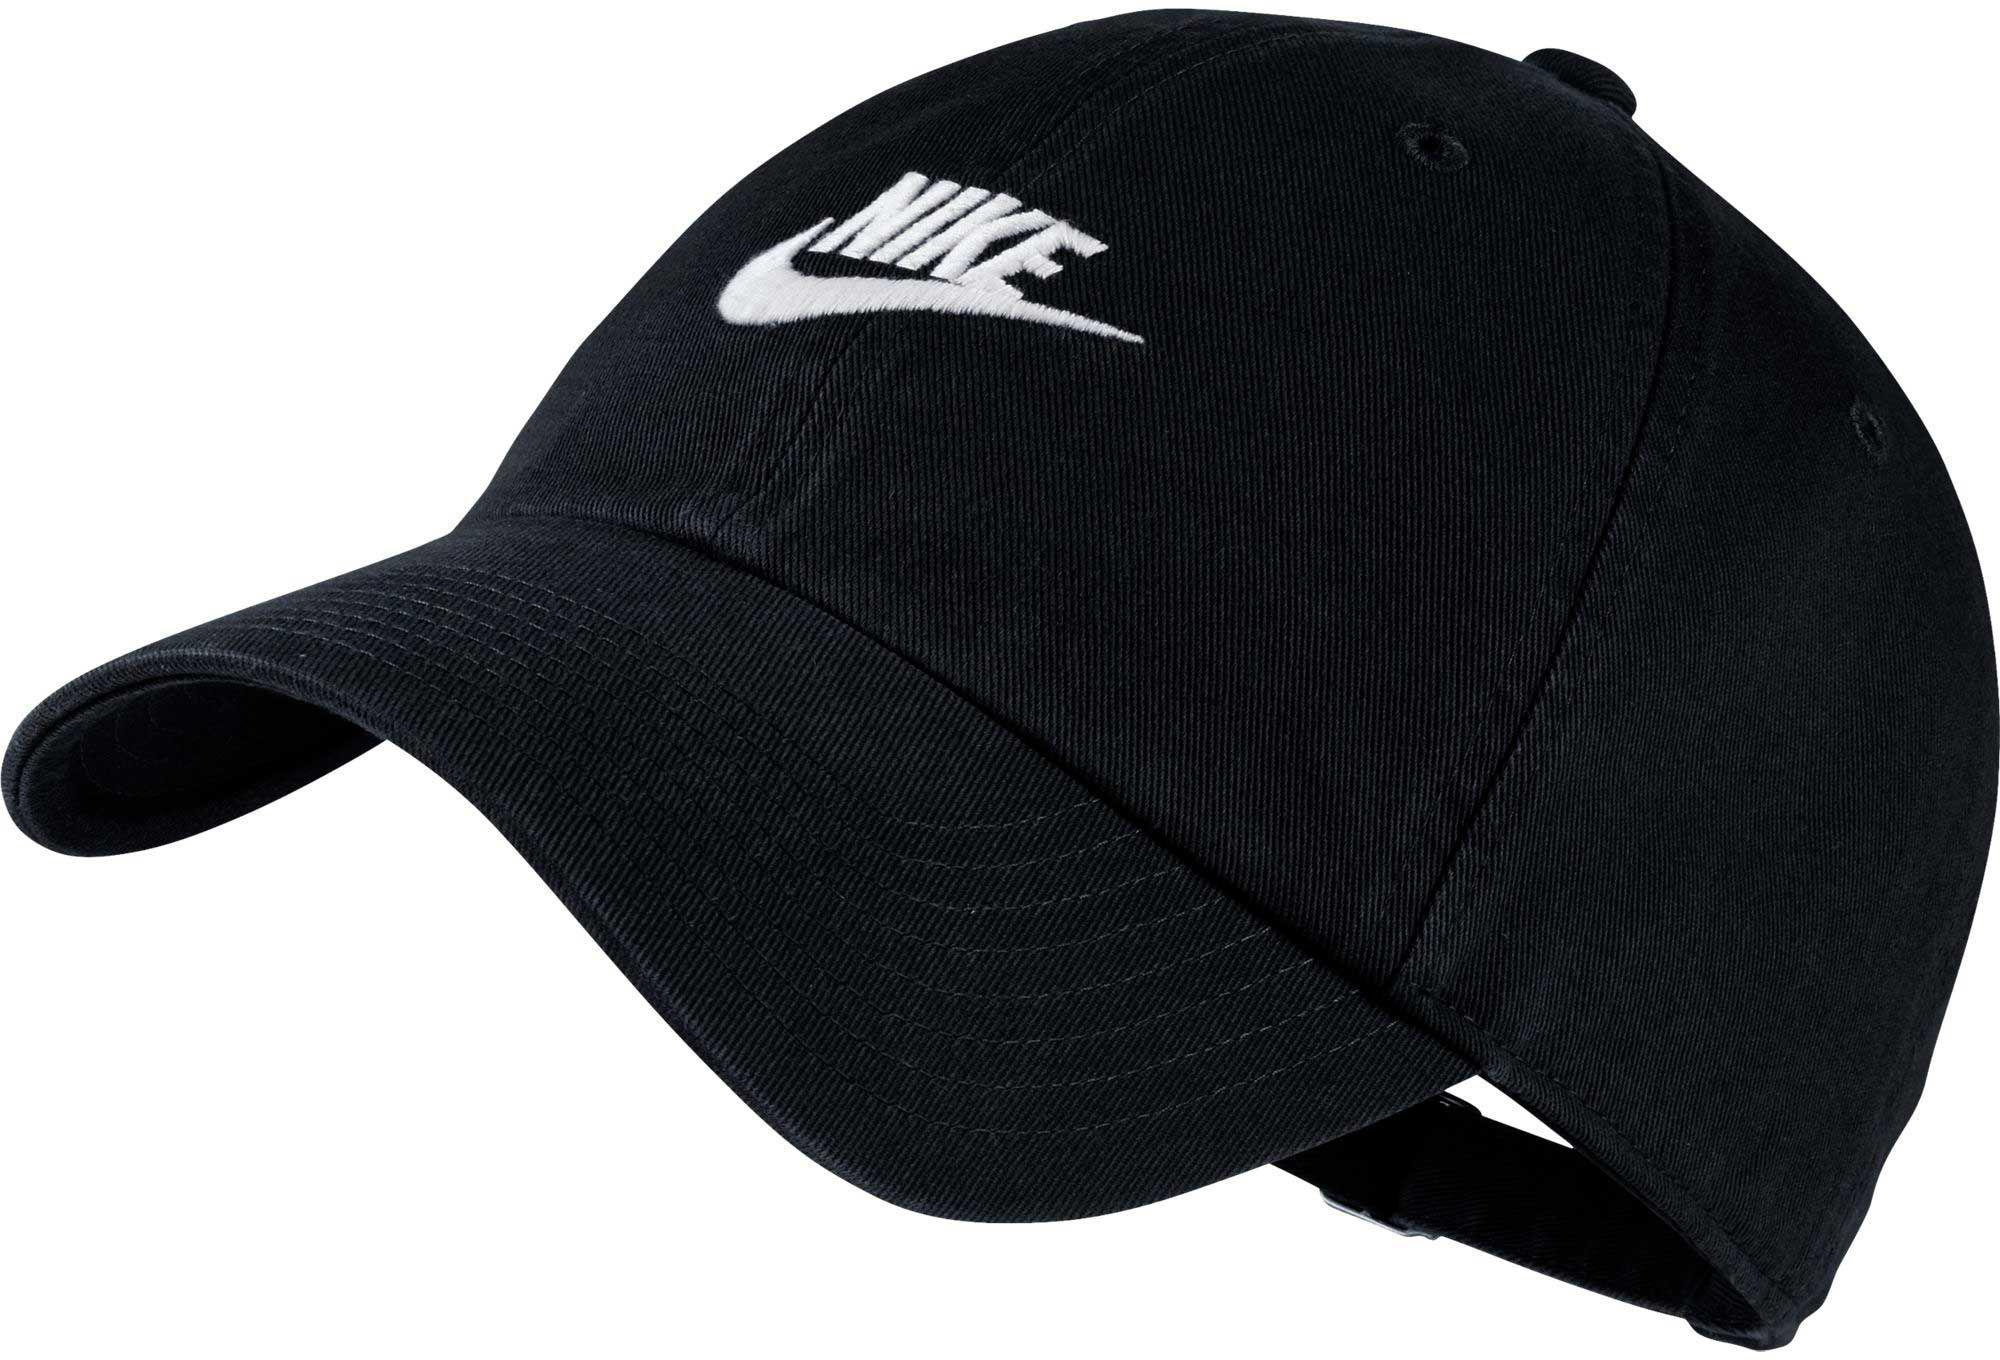 0d9f16294a0e9 Nike Sportswear H86 Cotton Twill Adjustable Hat in Black for Men - Lyst